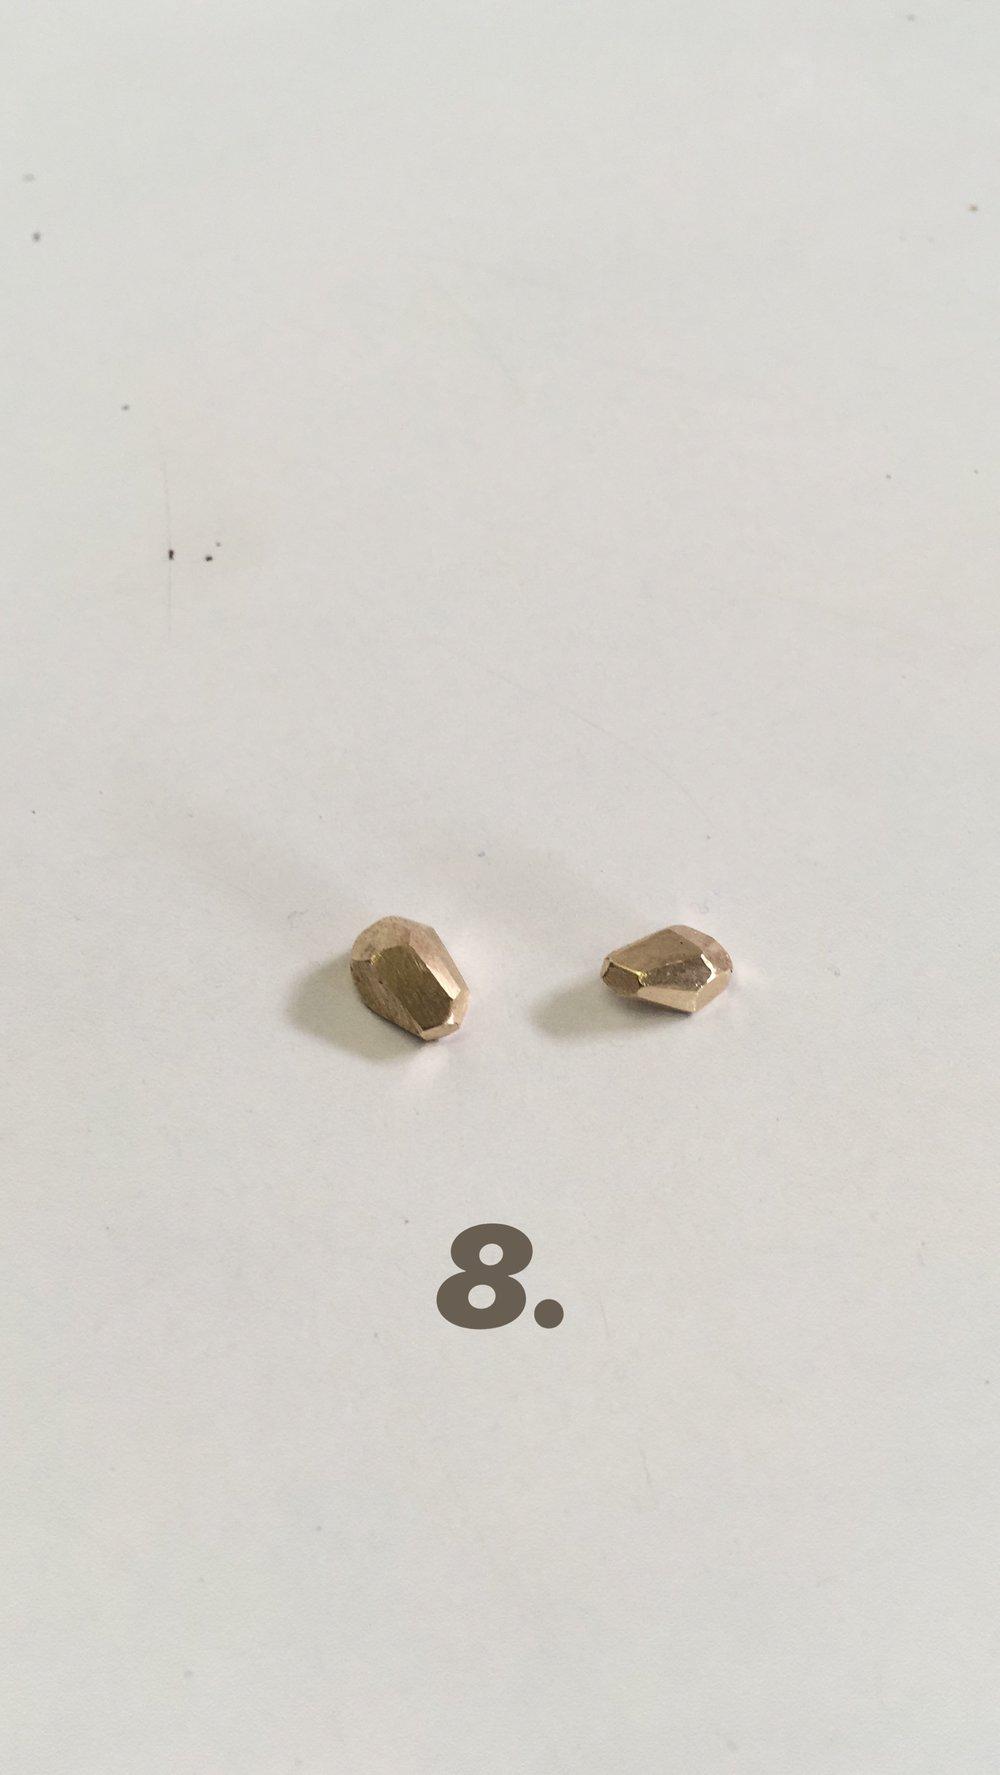 IMG-6128.JPG